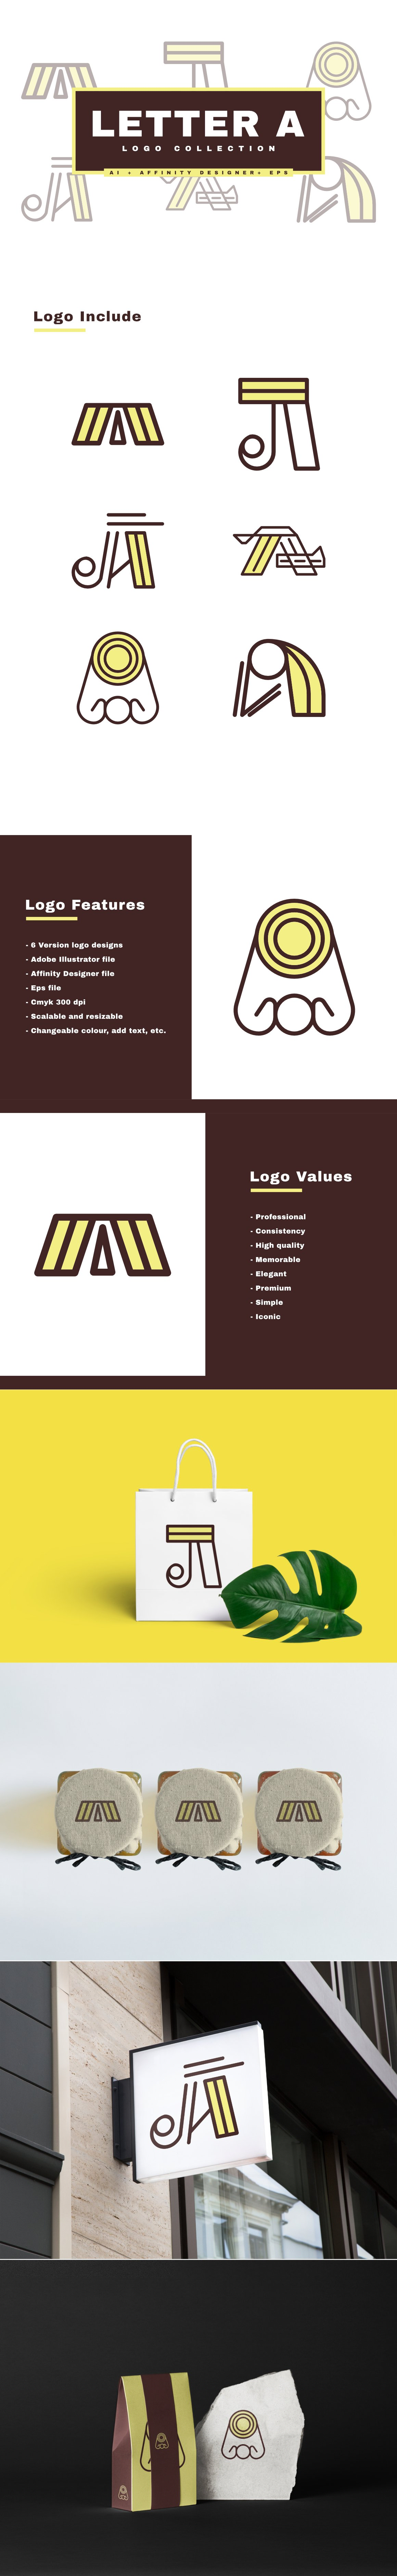 Letter A - Logo Collection - presentataion 3